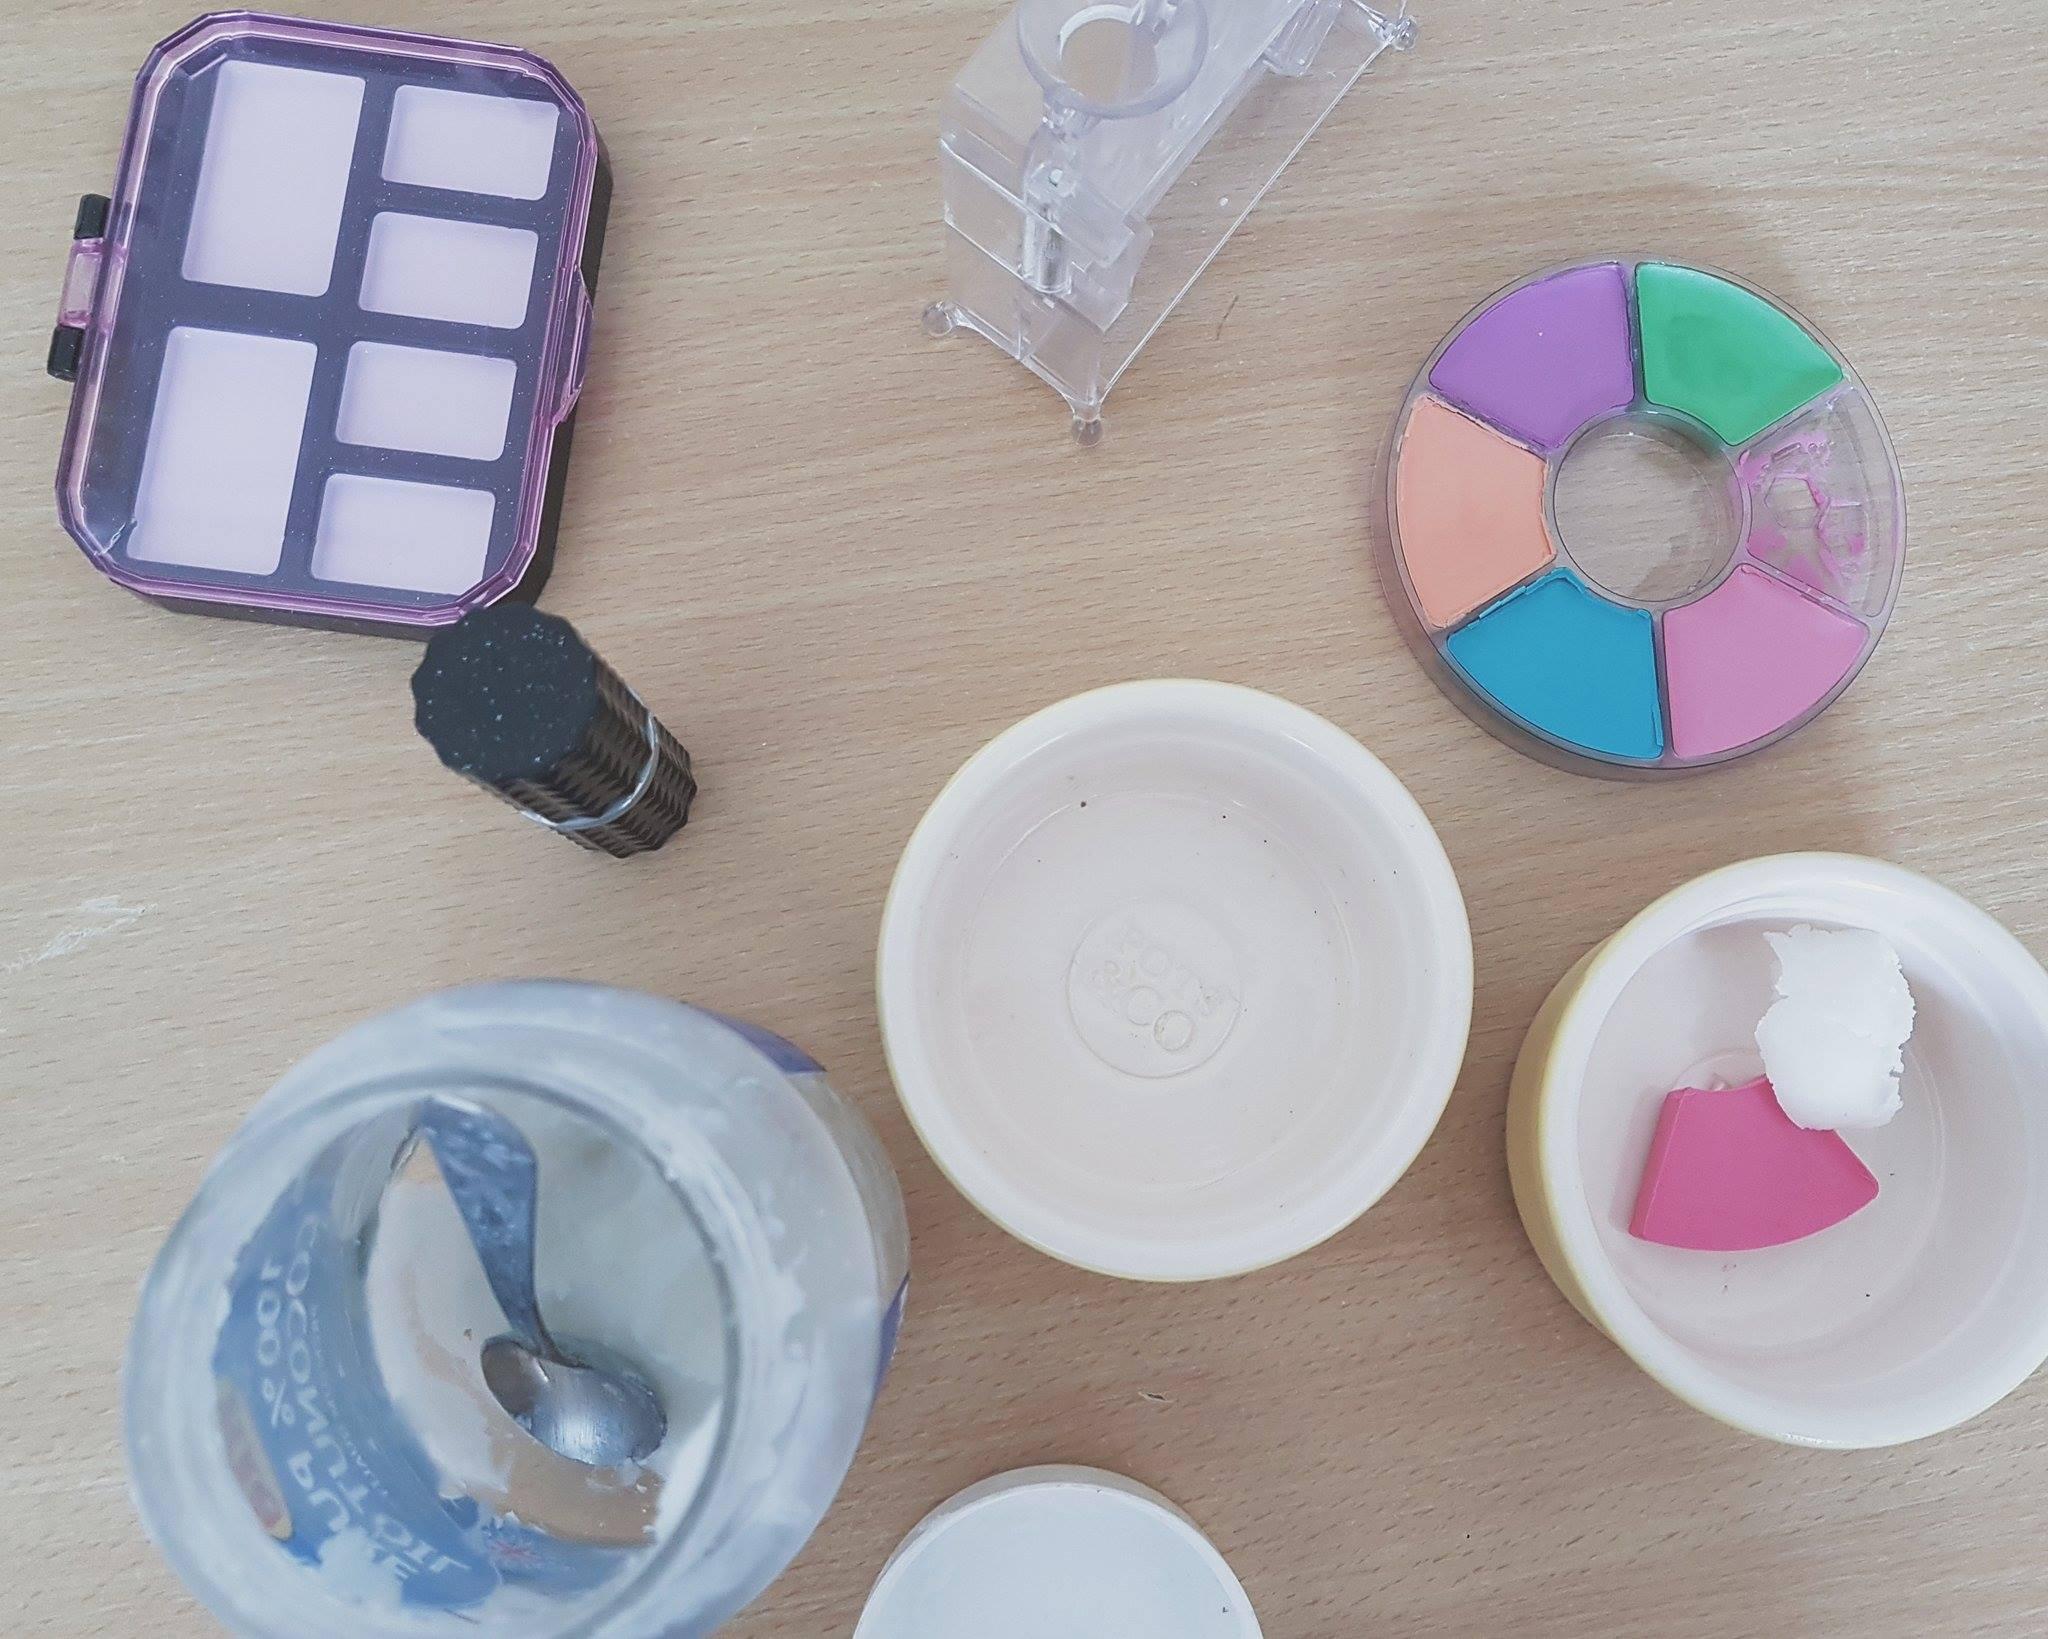 project-mc2-crayon-make-up-science-kit